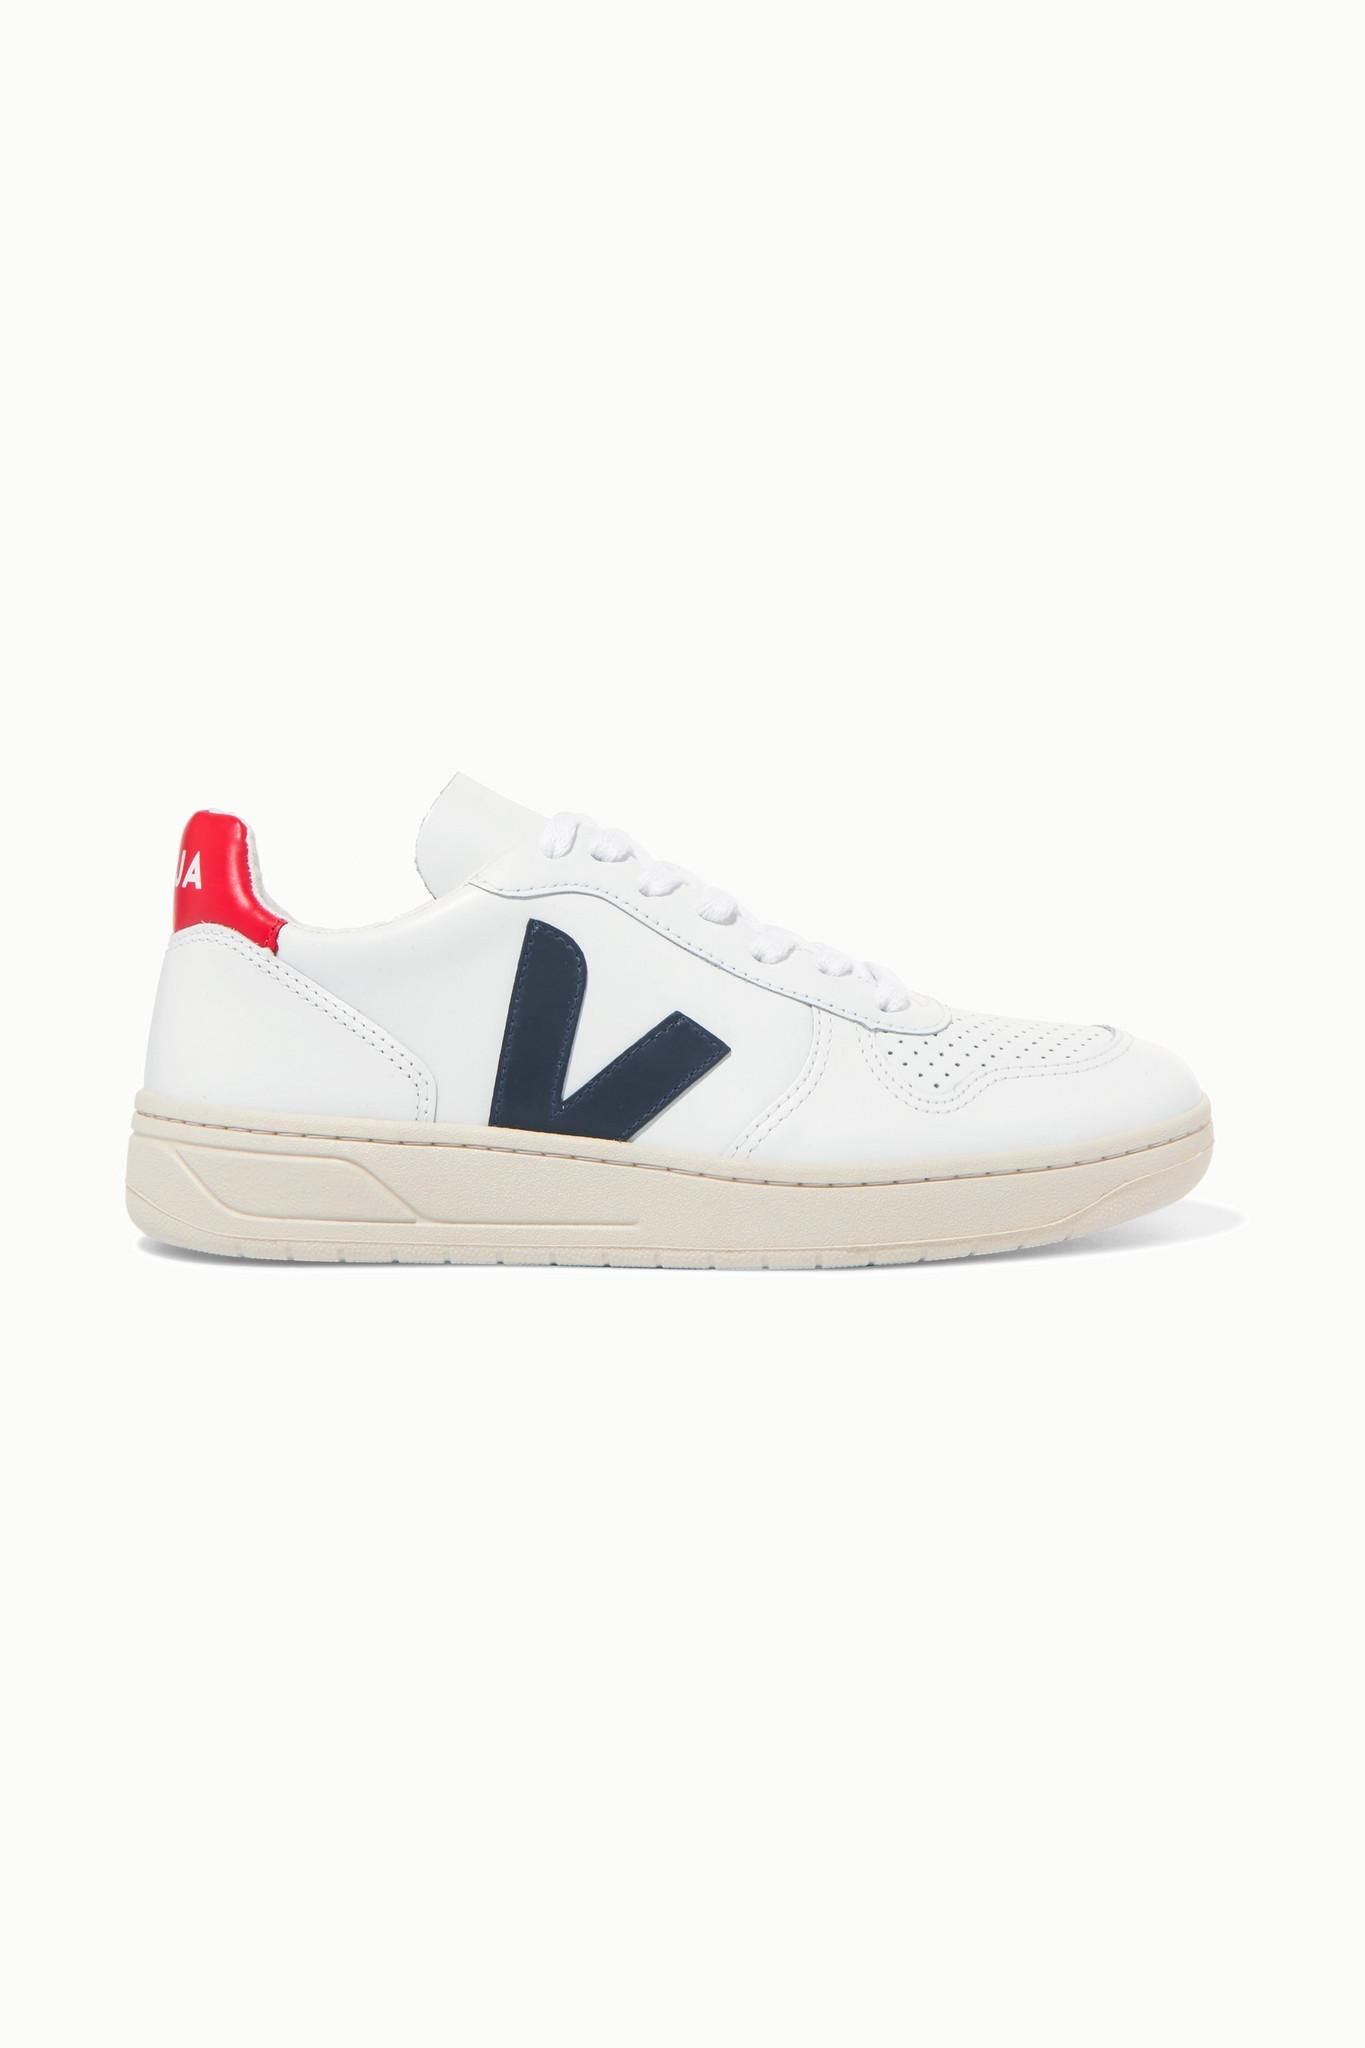 VEJA - + Net Sustain V-10 Leather Sneakers - White - IT37